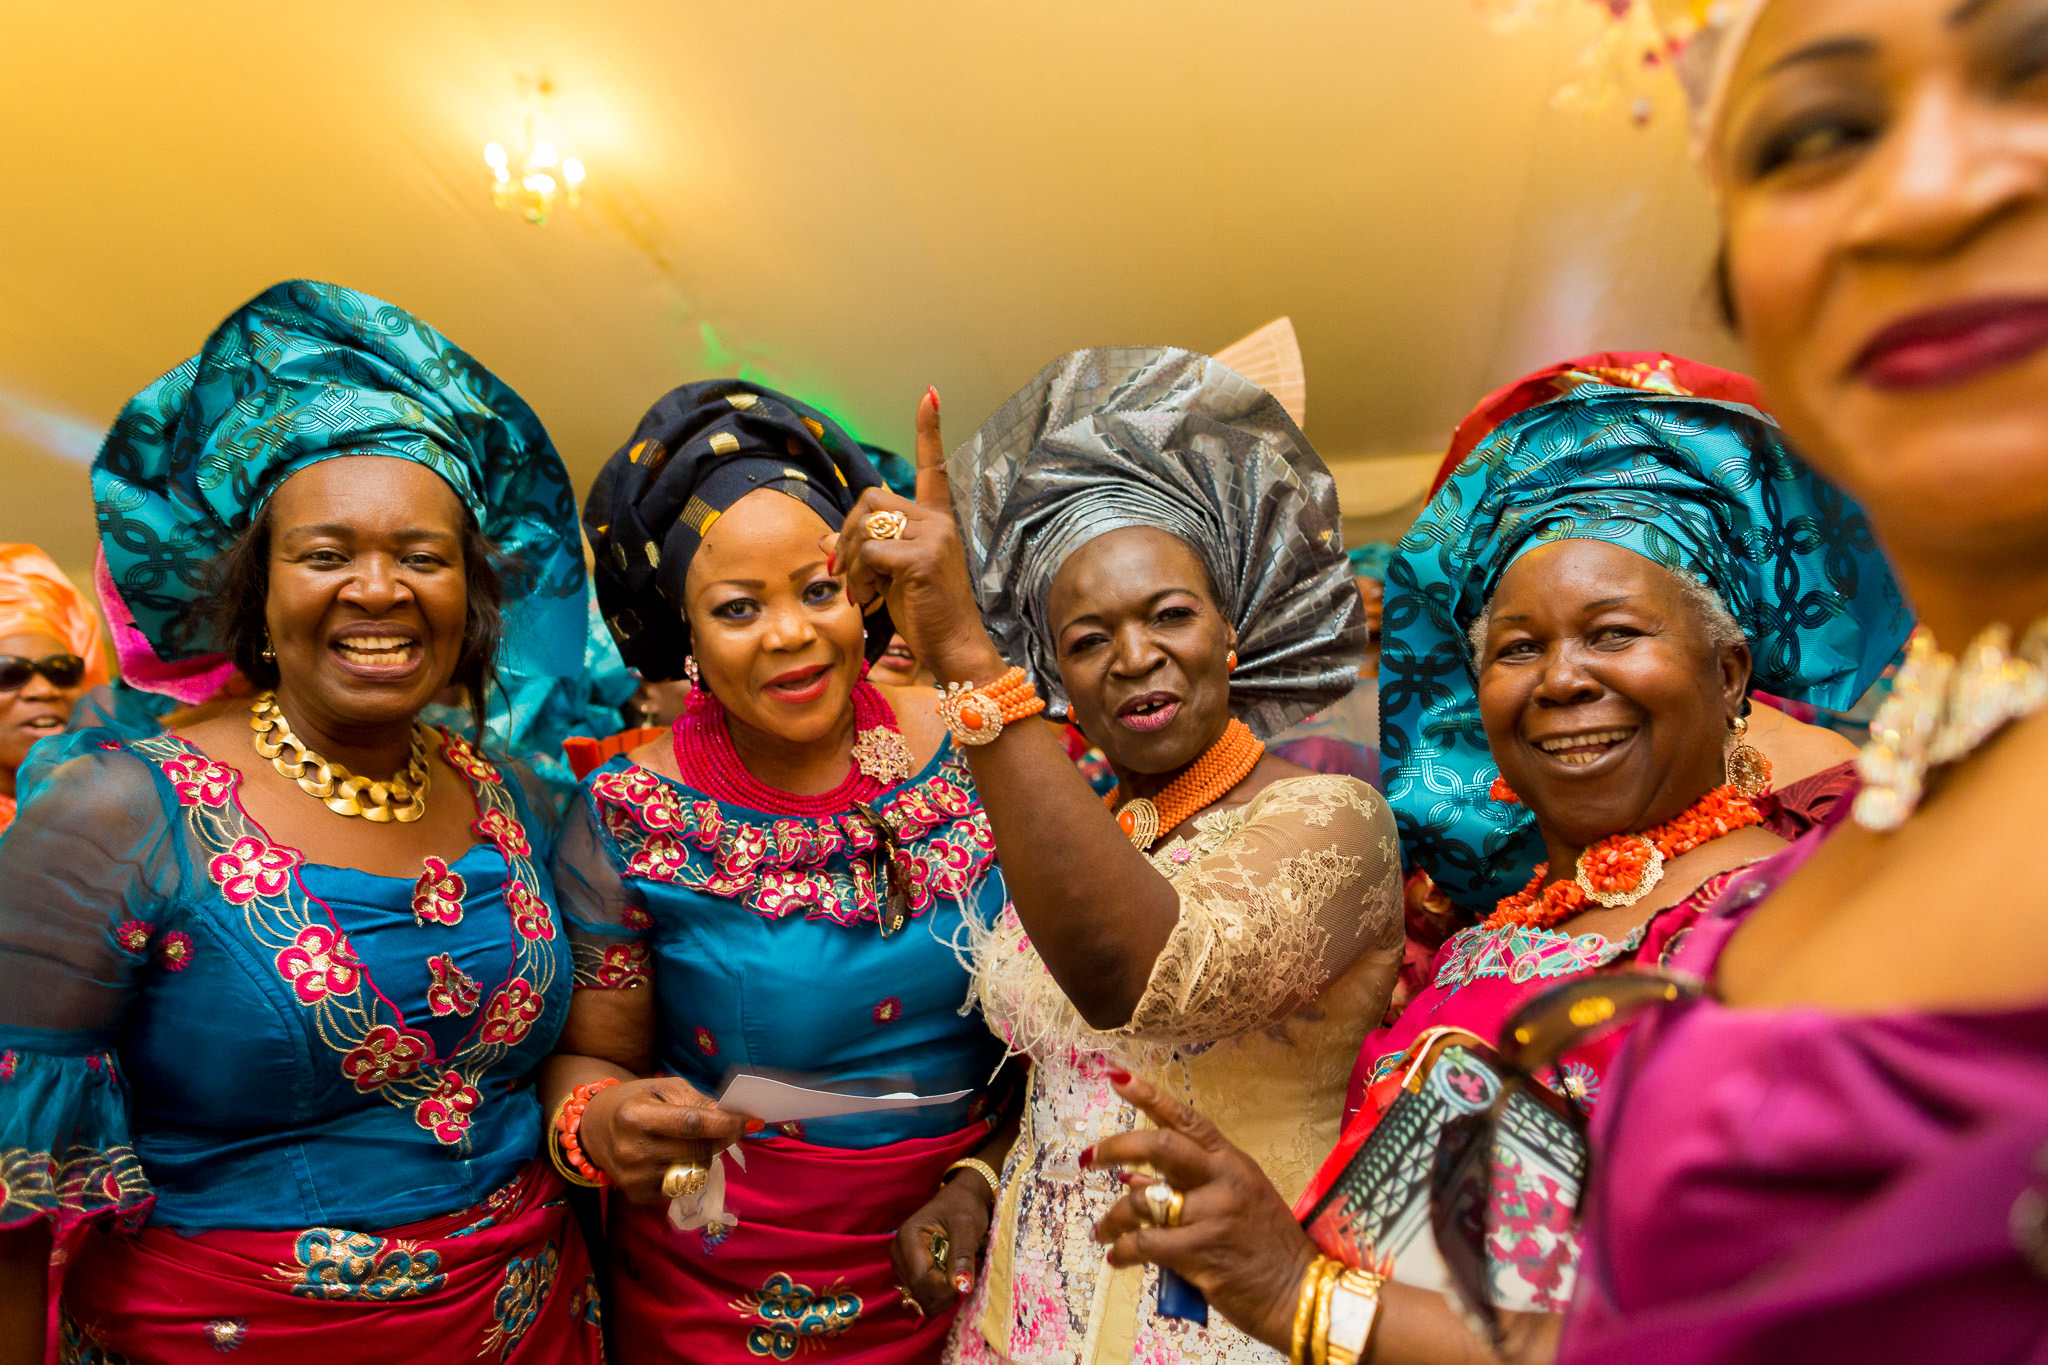 Addington Palace wedding nigerian woman dancing in their colourful dresses